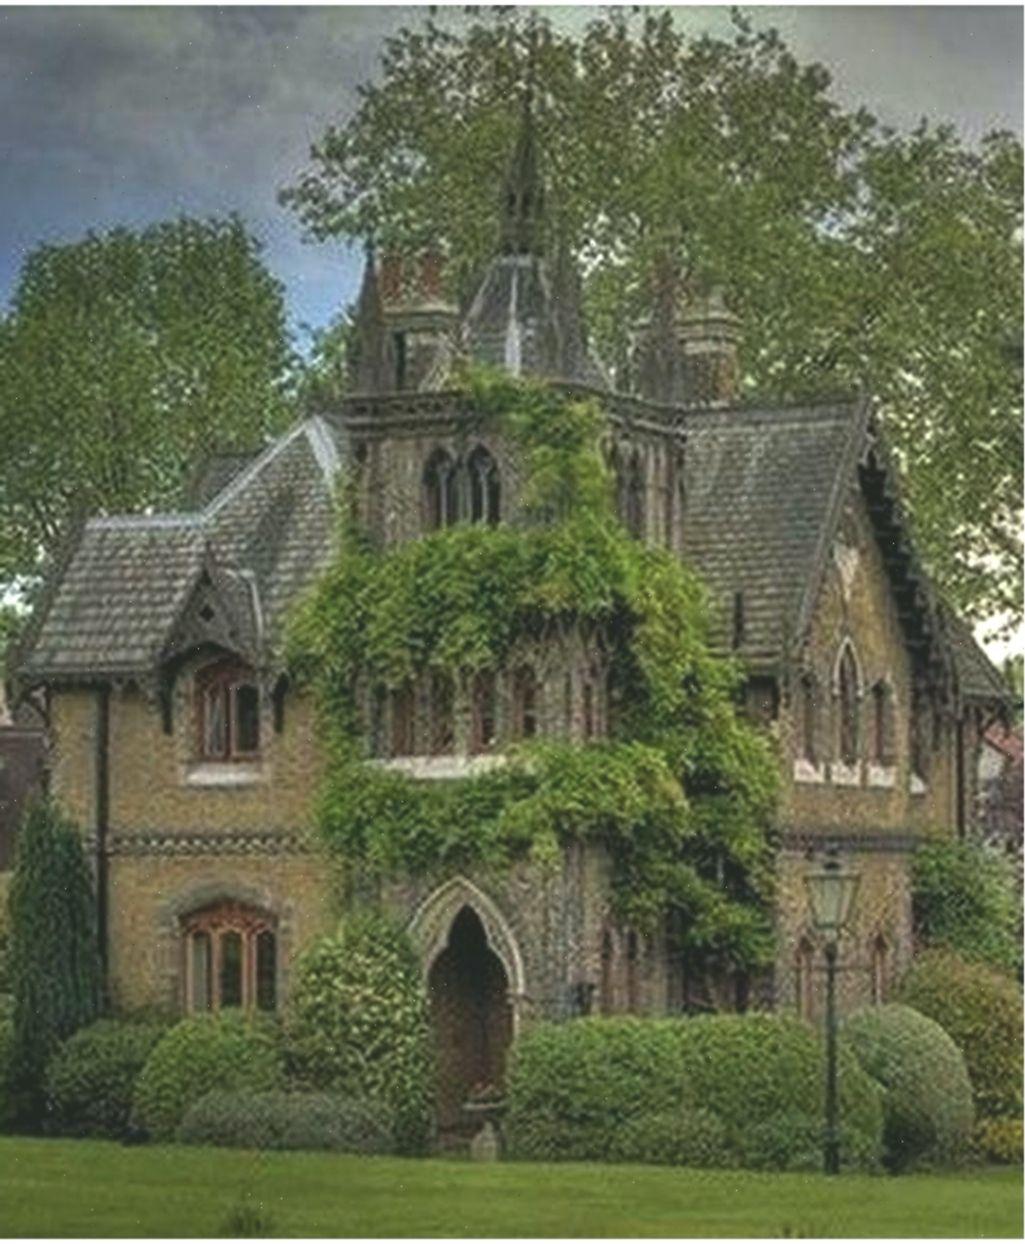 34 Amazing Gothic Revival House Design Ideas Spanish Style Gothichouseexterior Amazing Design Gothic Gothichouse Gothic House Victorian Homes Architecture